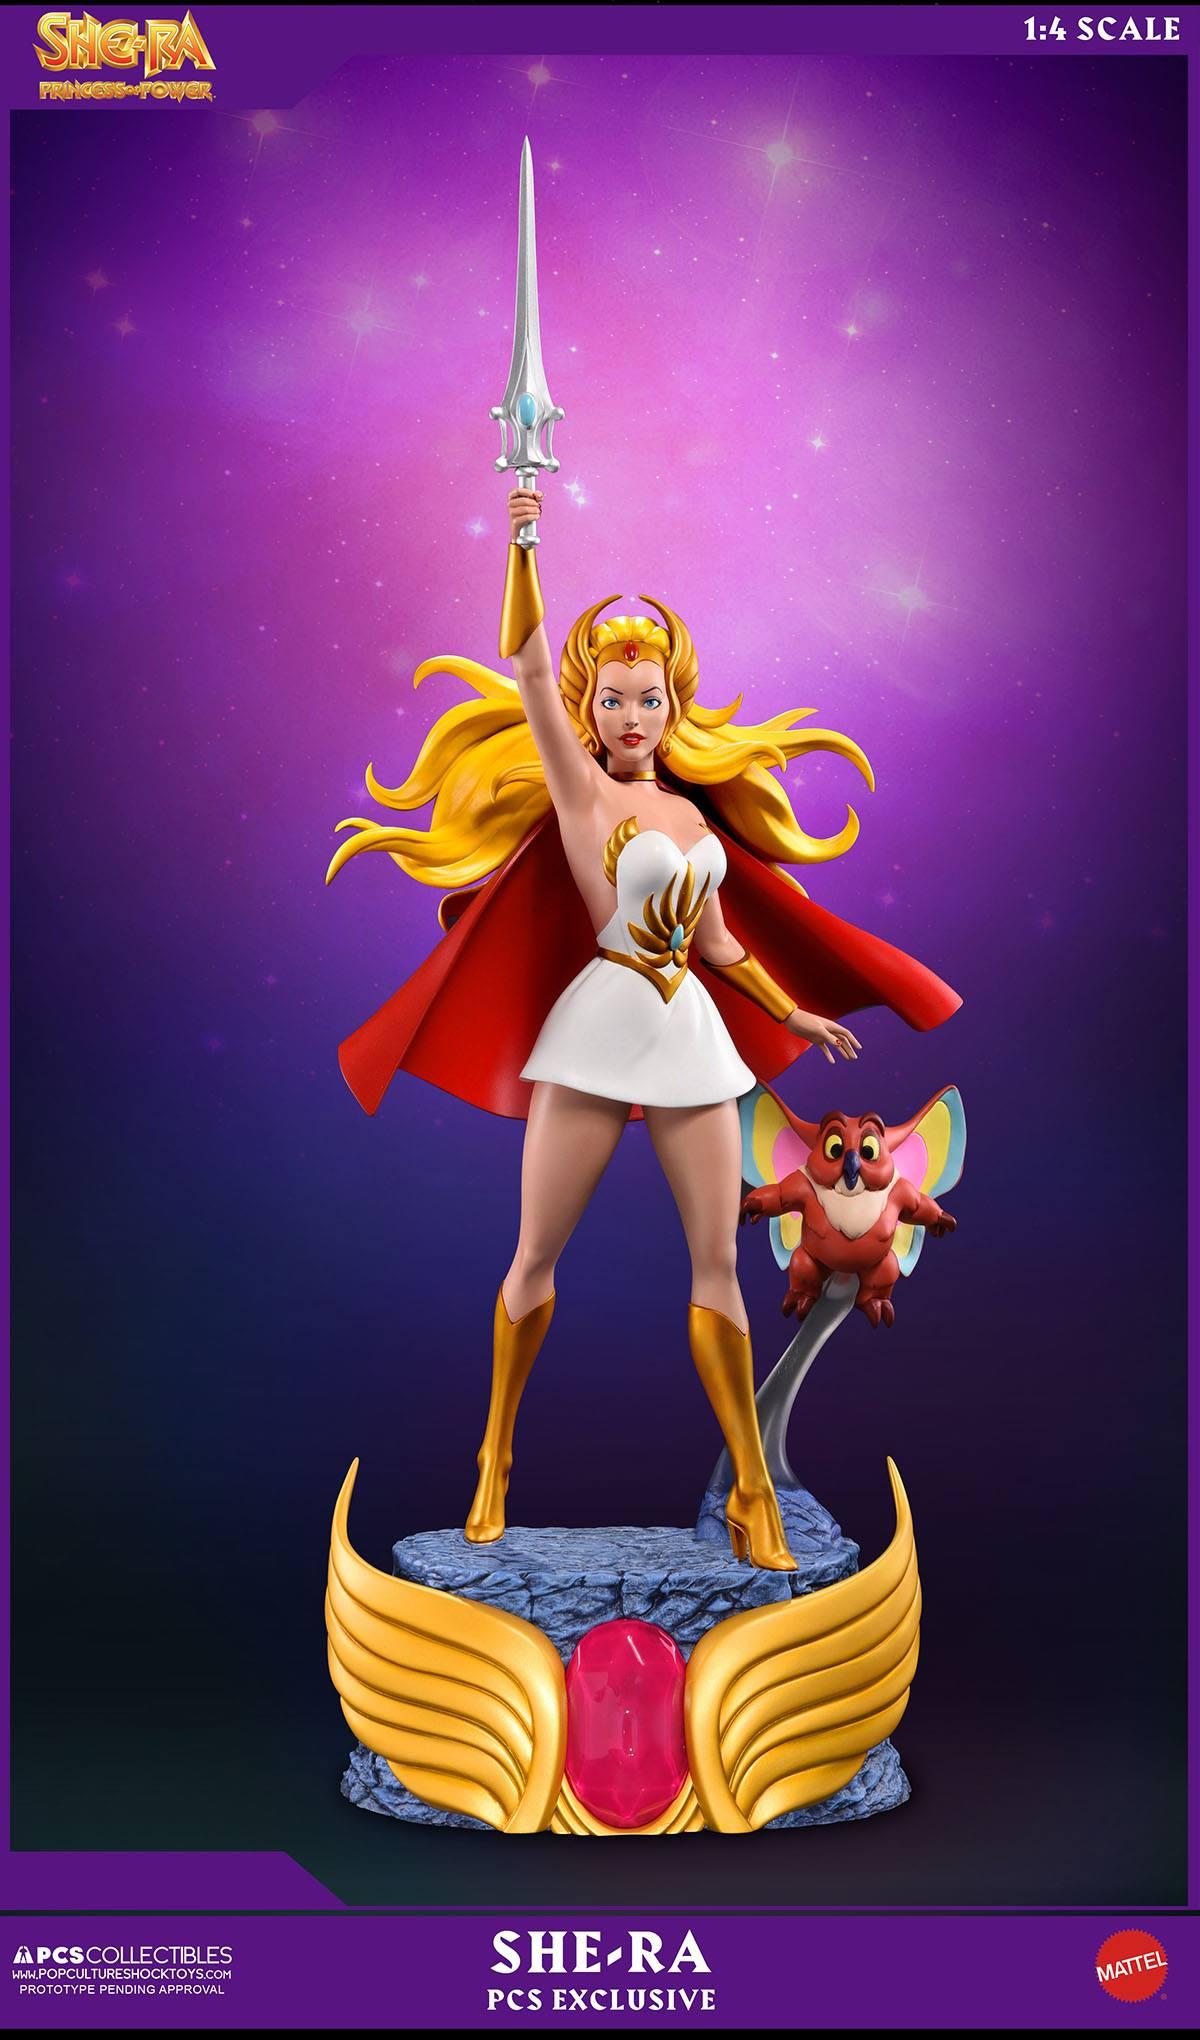 She-Ra Princess of Power - Complete Collection Anime, DVD